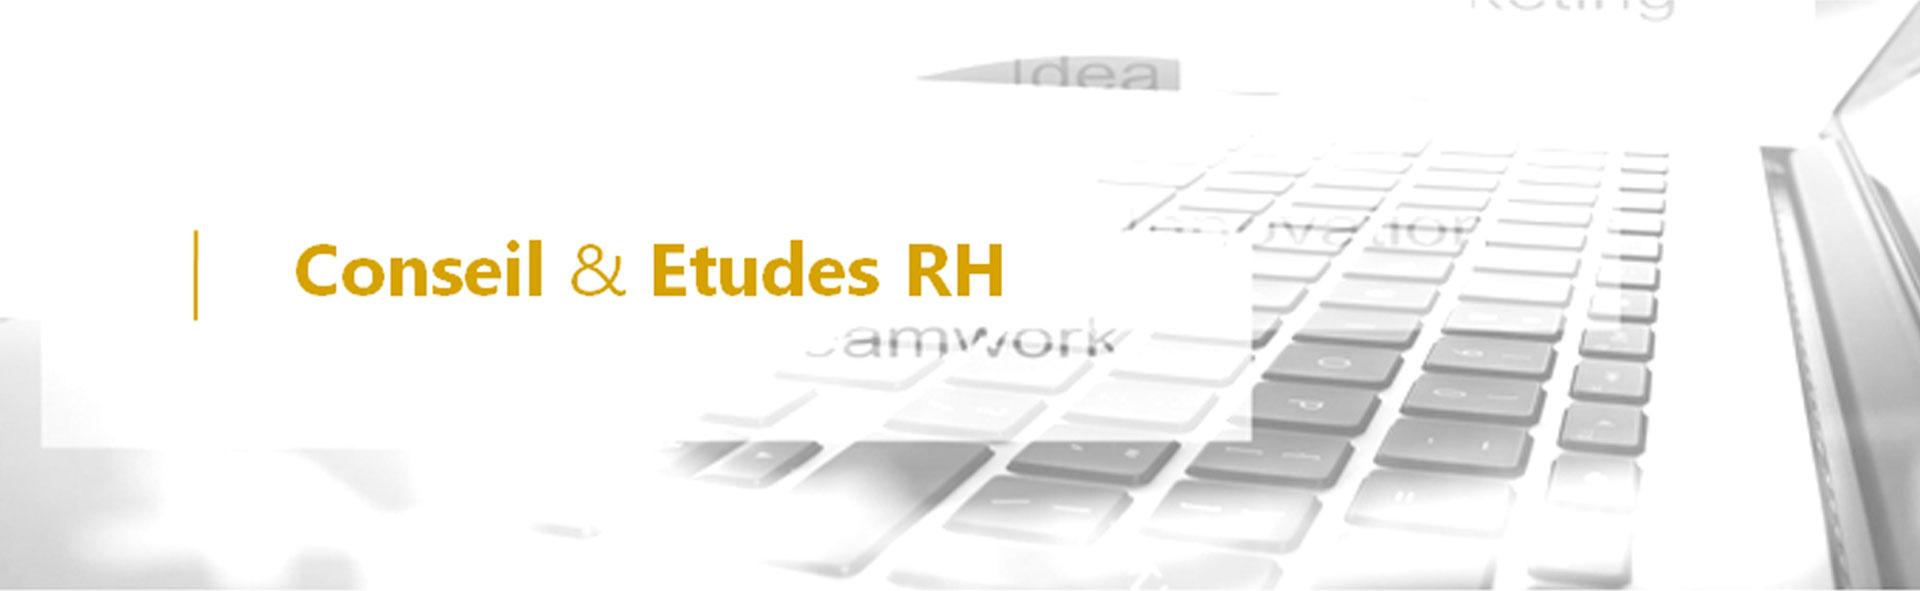 Conseil etudes RH - INVEST RH